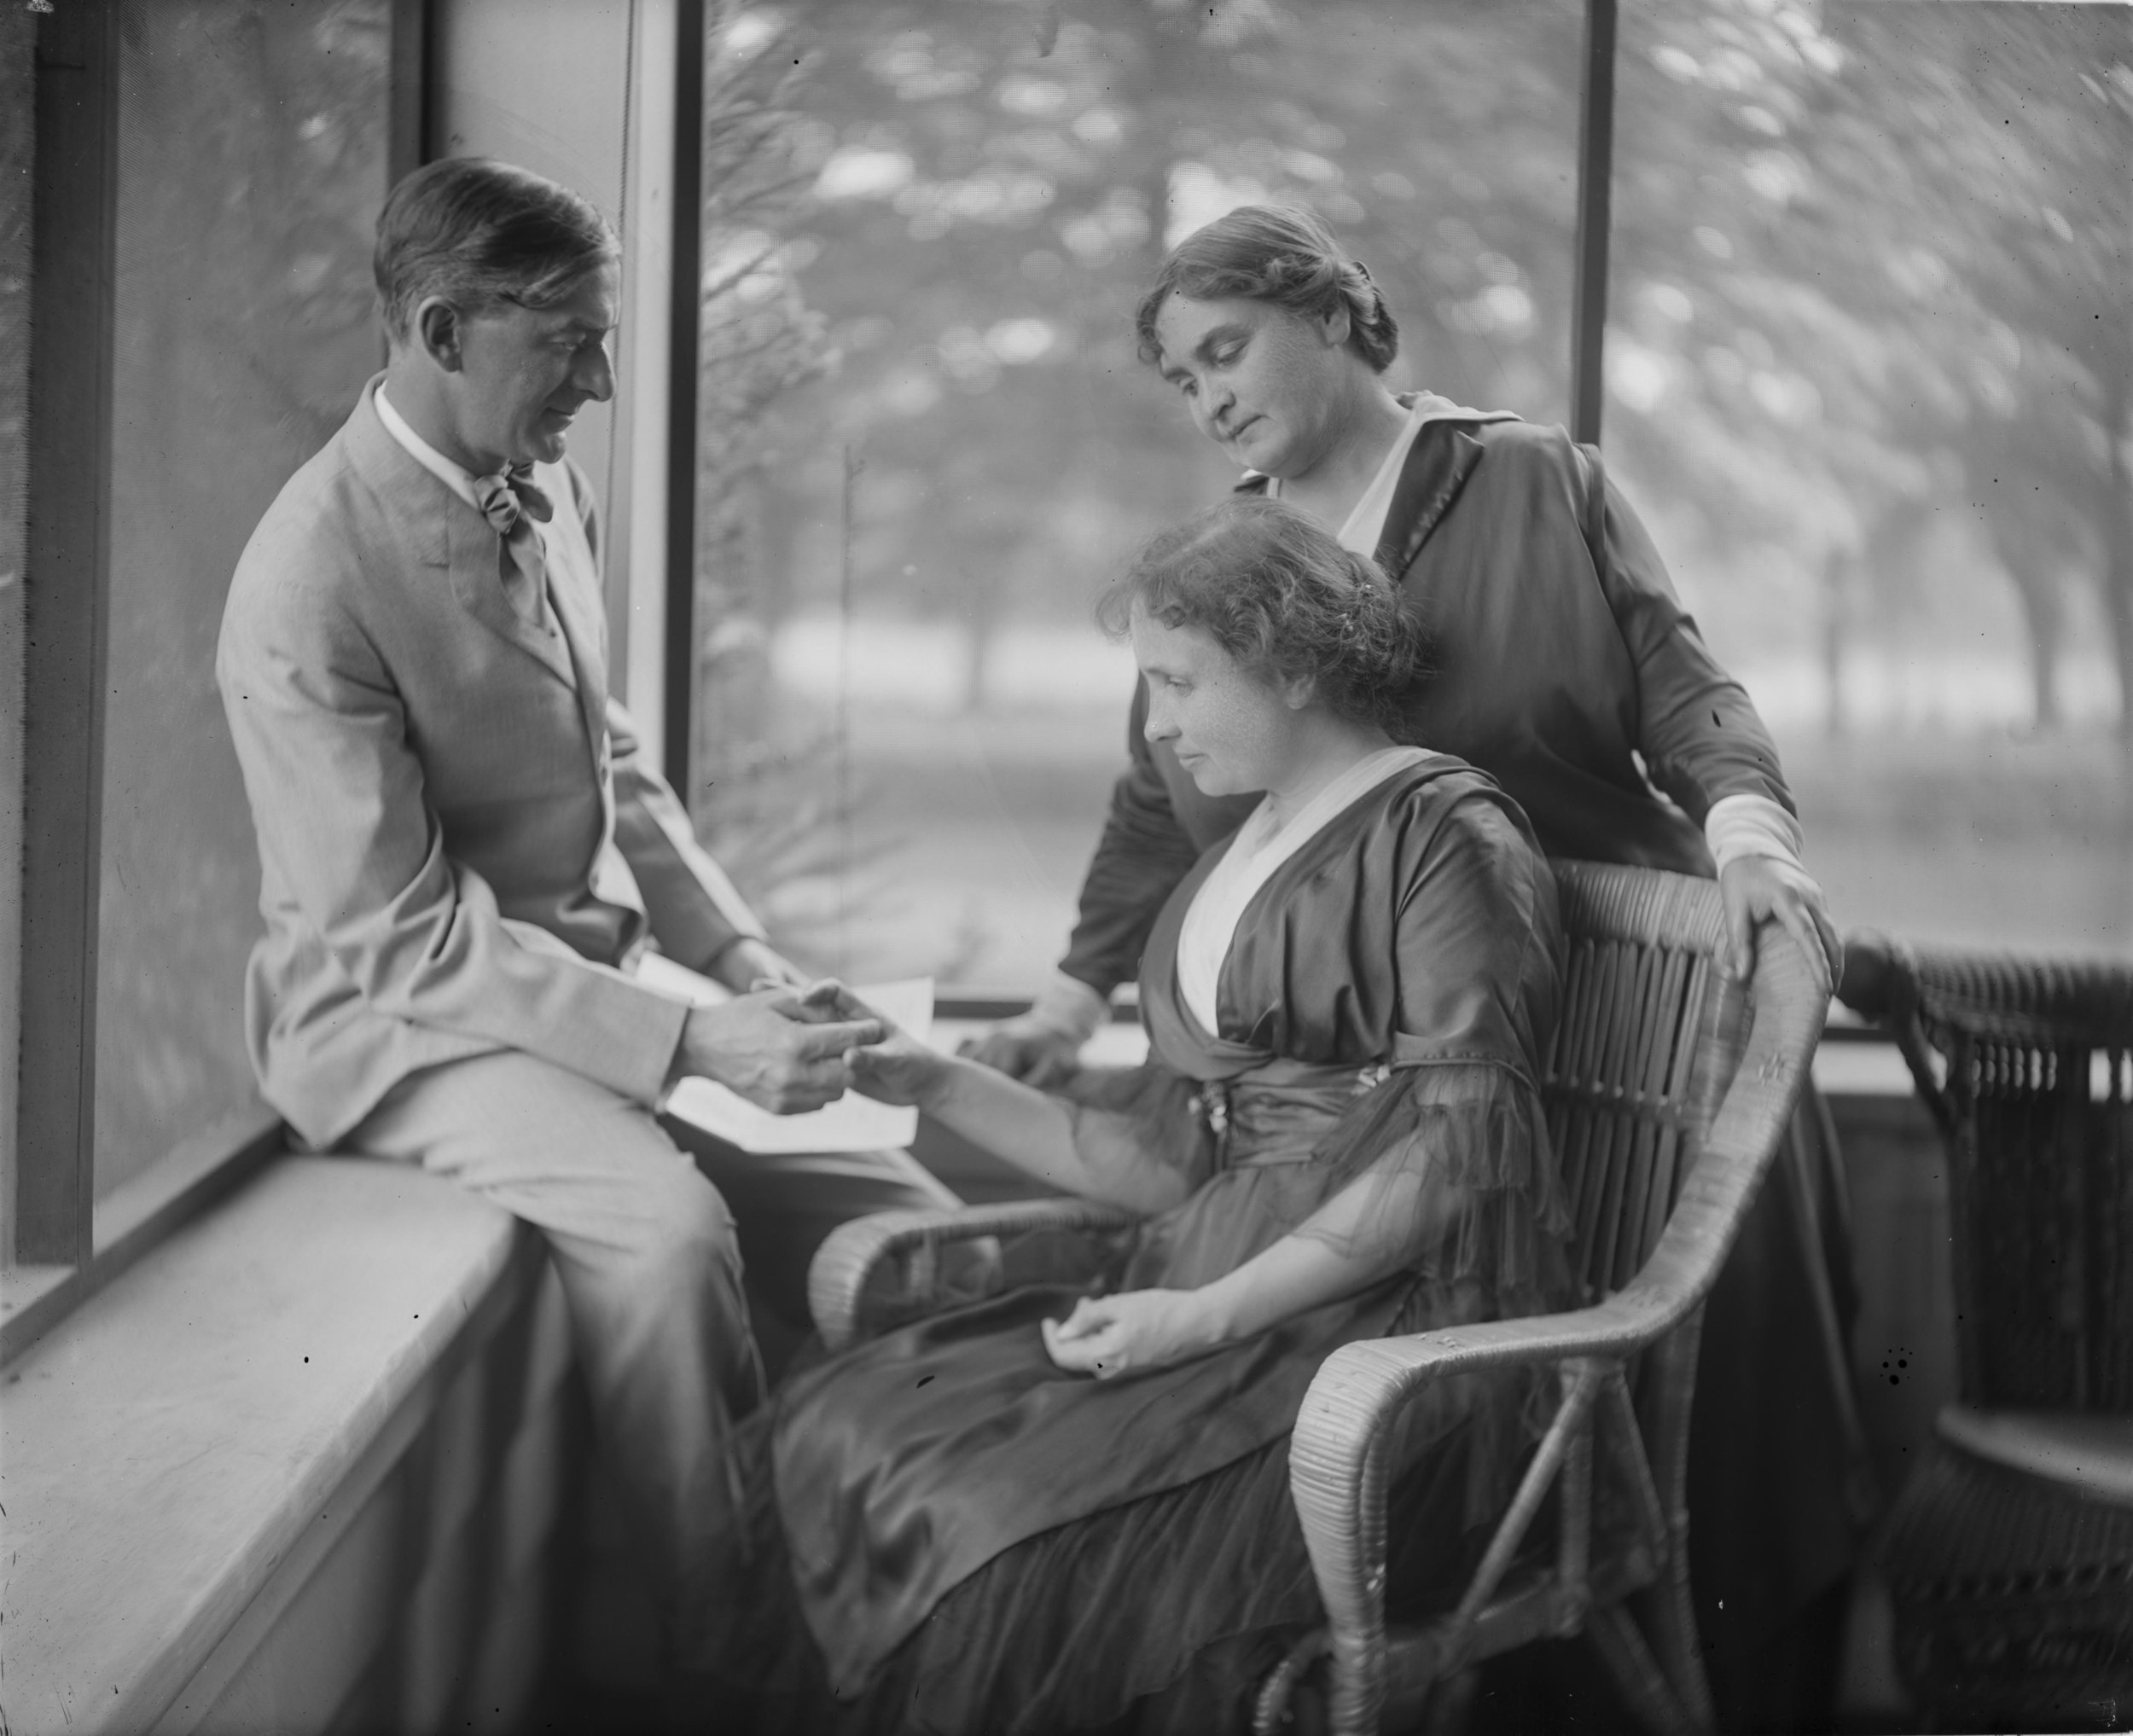 Portrait_of_Helen_Keller_with_Annie_Sullivan_Macy_and_John_Macy,_ca._1909-1919._(25736673310).jpg